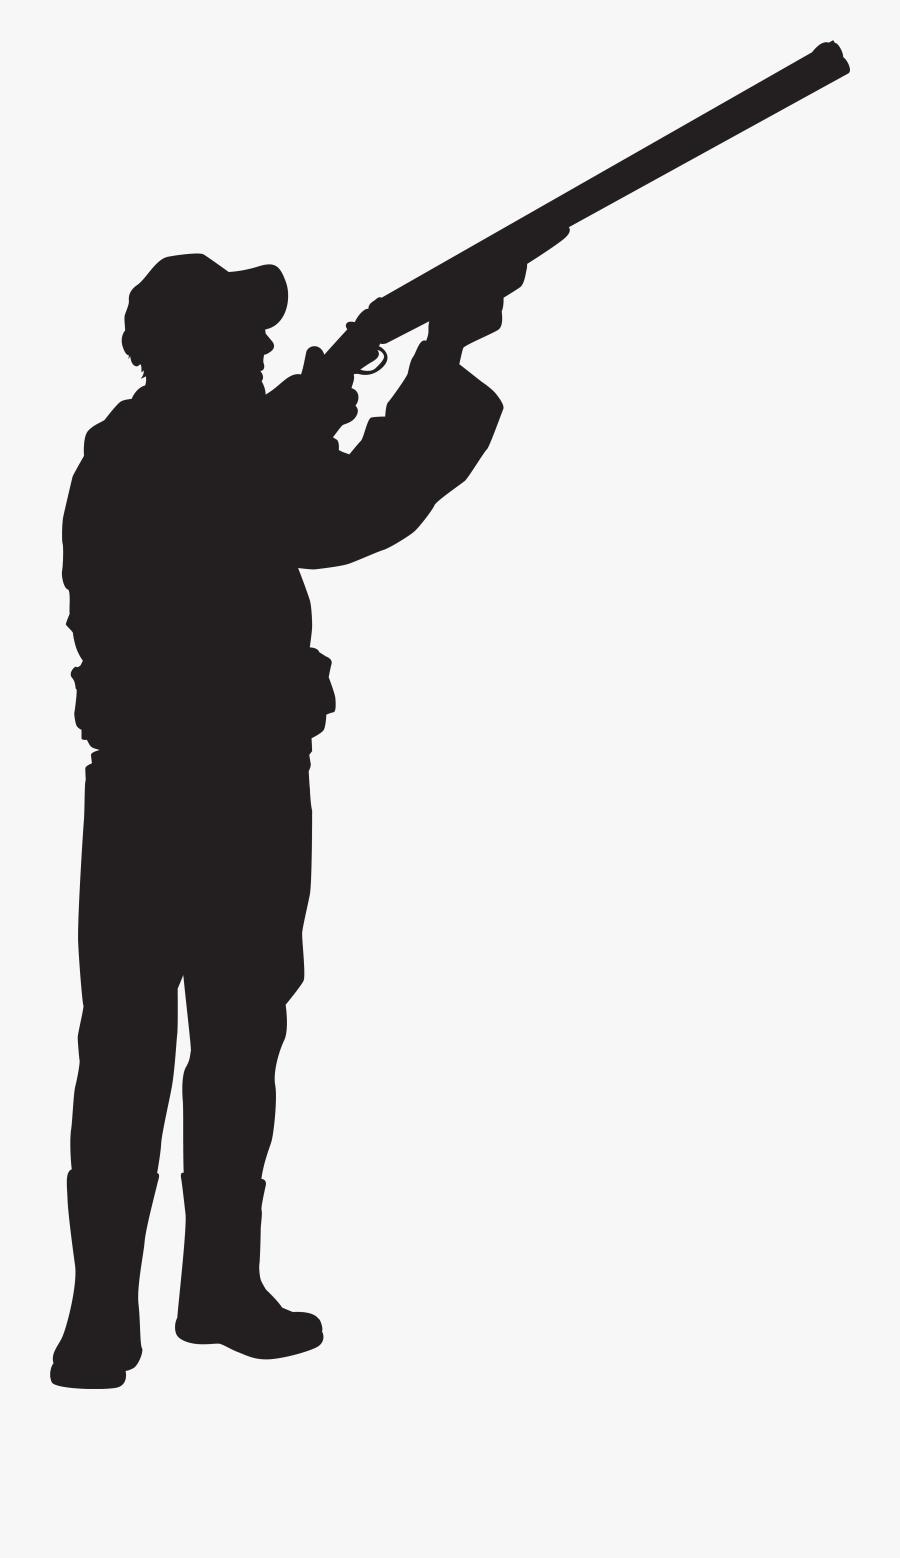 Hunting Silhouette Shooting Sport Clip Art - Hunter Clipart Transparent, Transparent Clipart